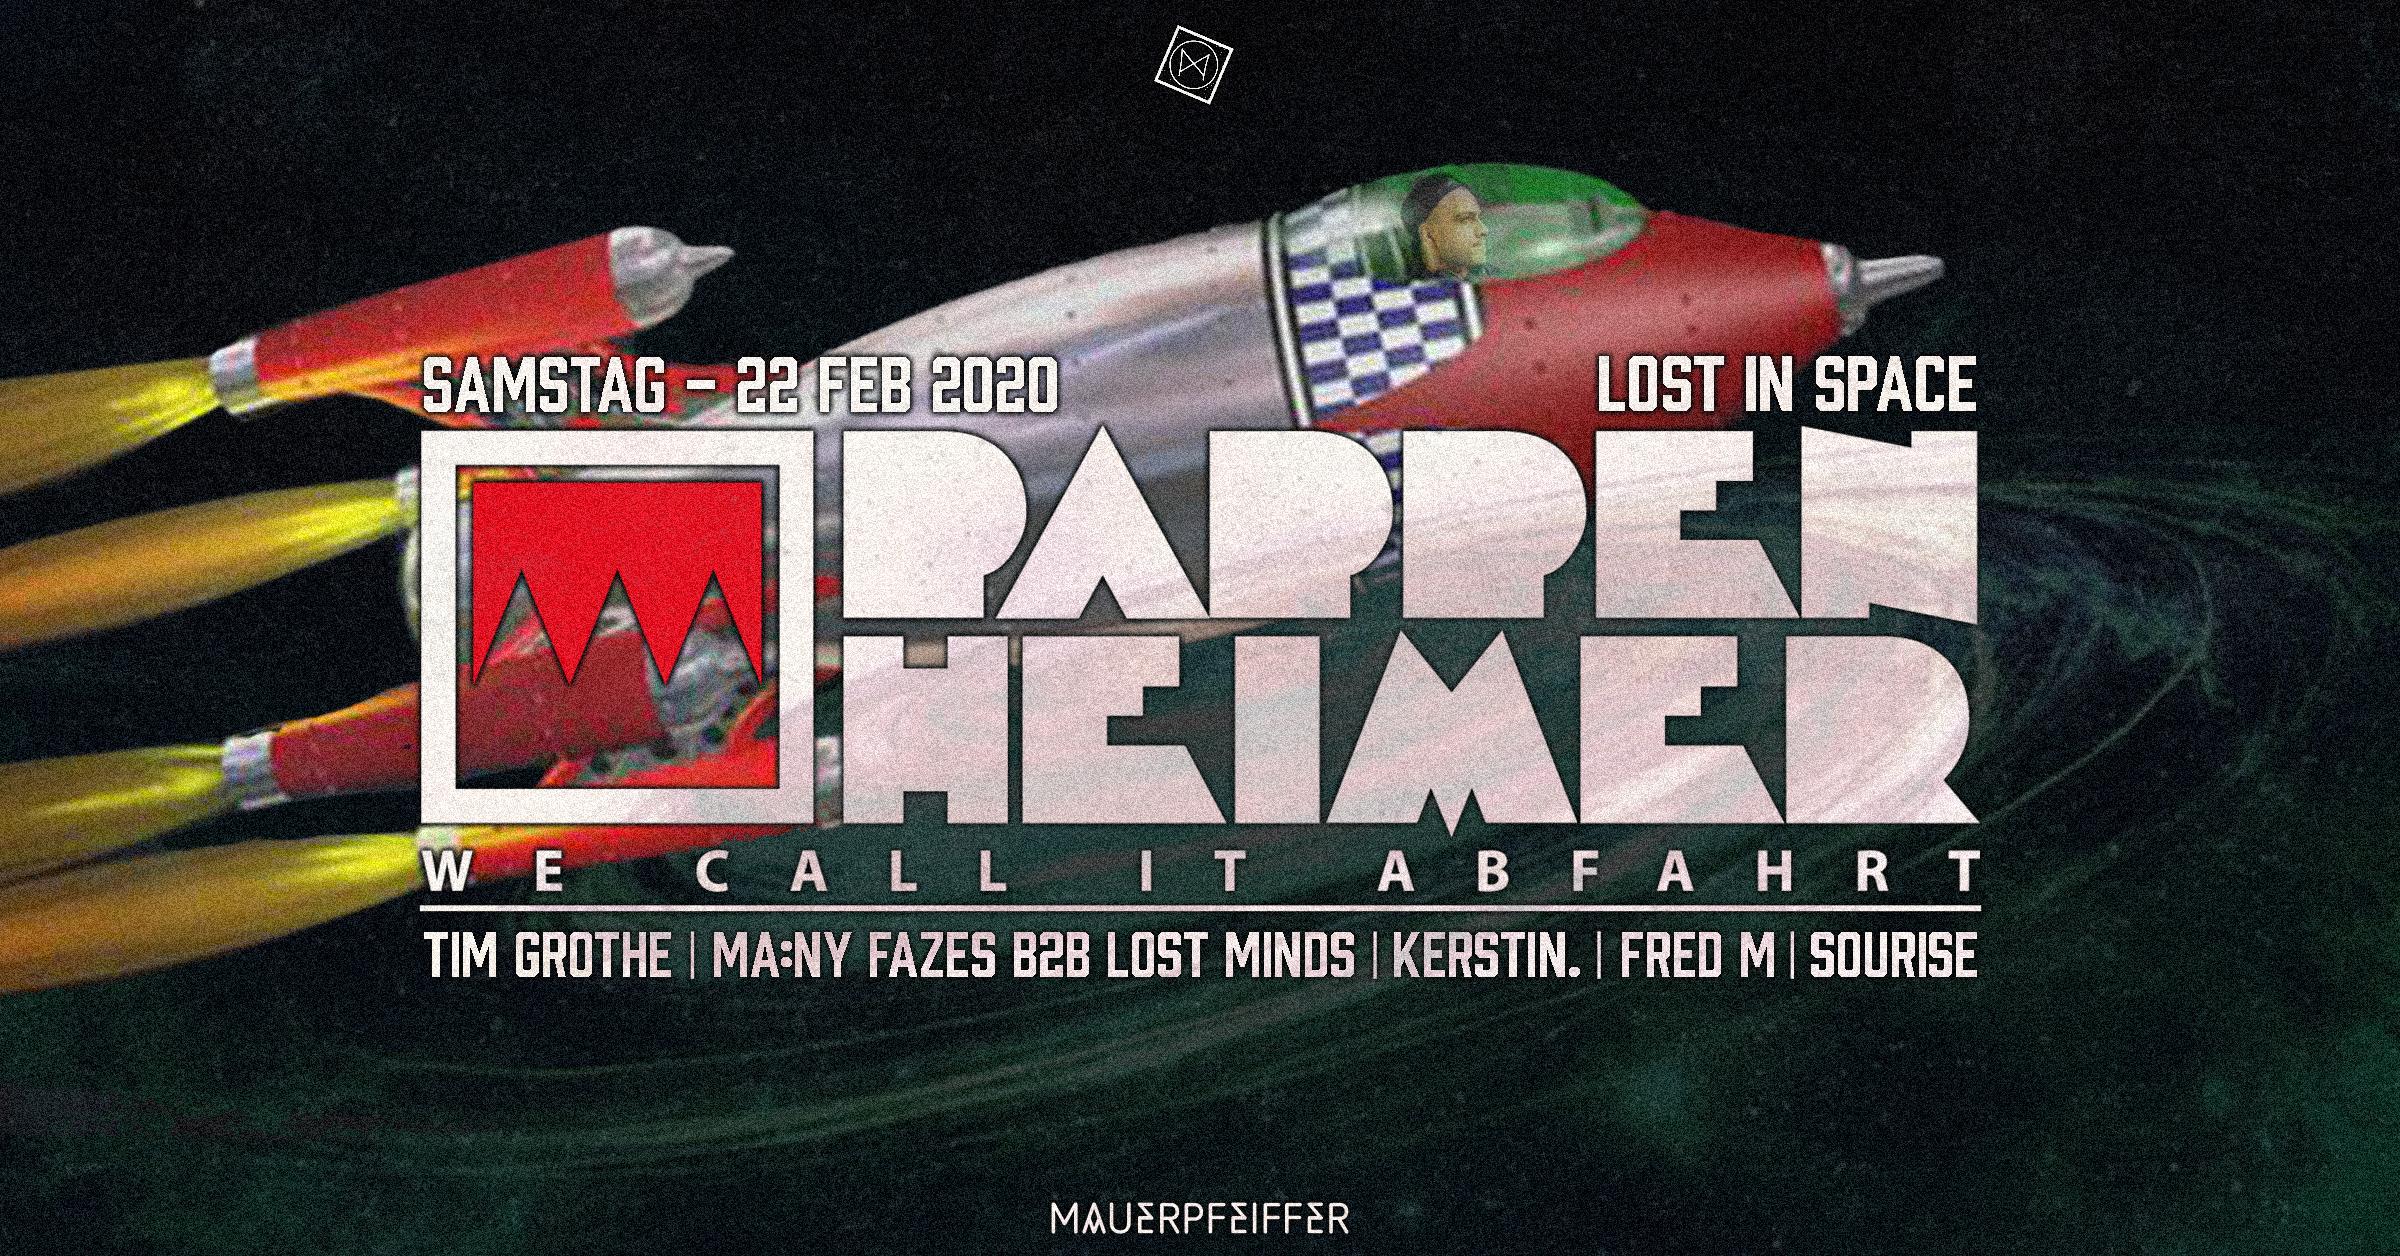 Lost in Space - Pappenheimer (7h DJ Set!)